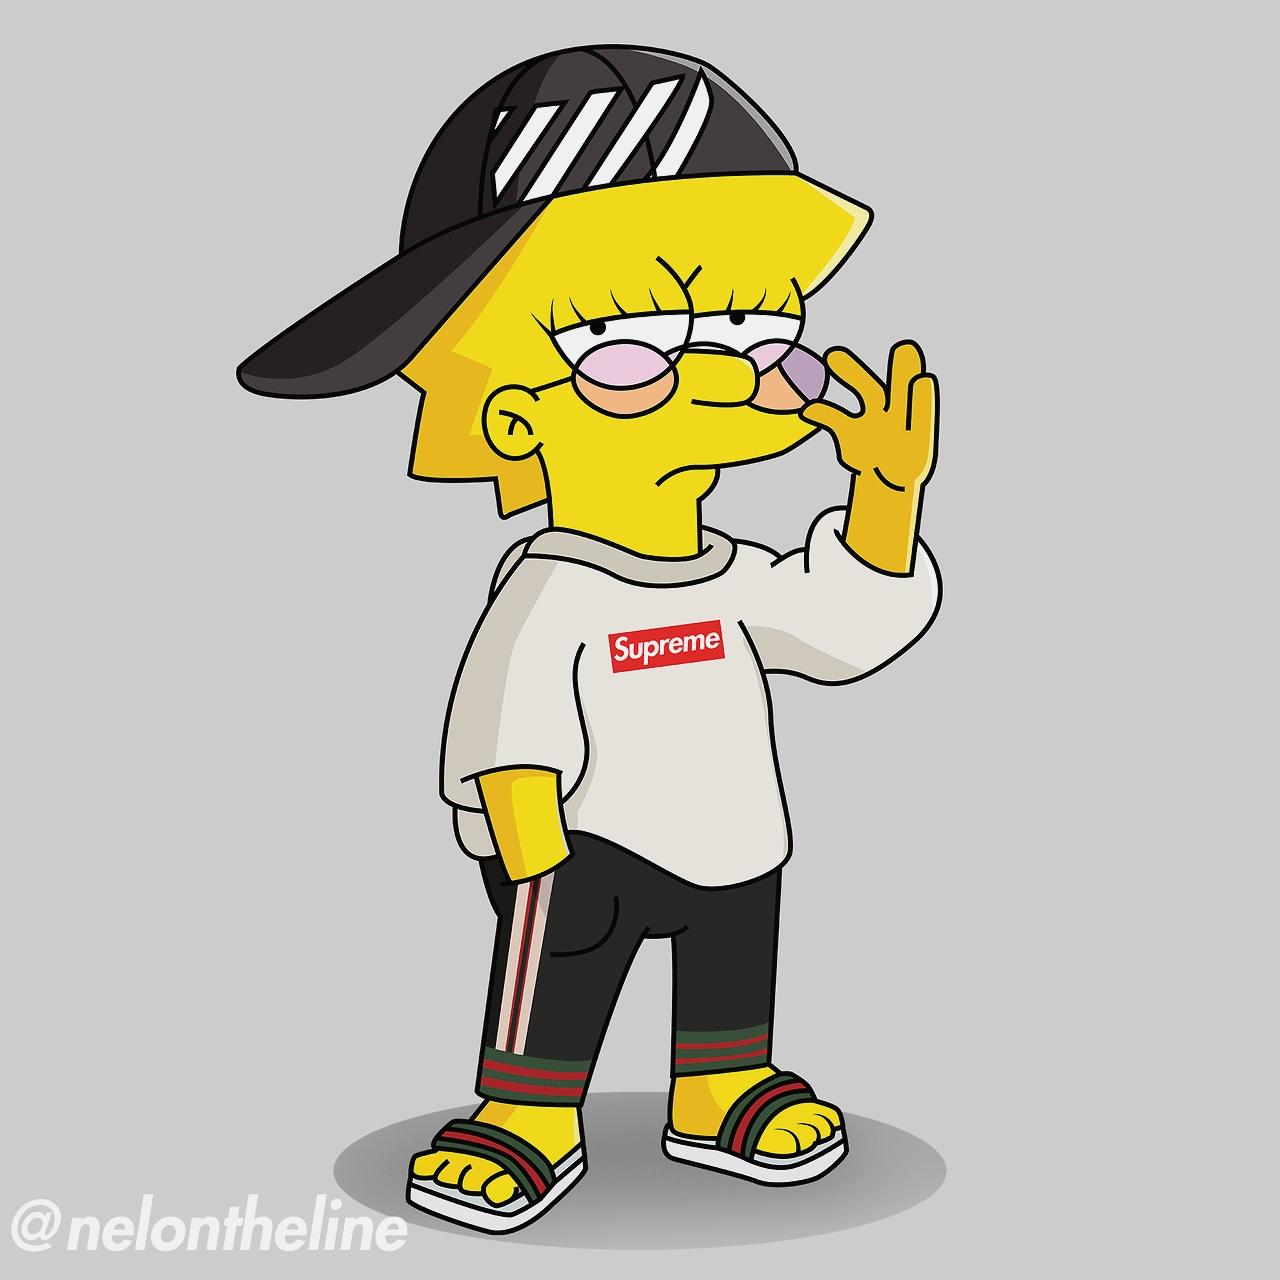 Supreme Bape Boy Gangsta Cartoons Wallpaper wwwgalleryneedcom 1280x1280